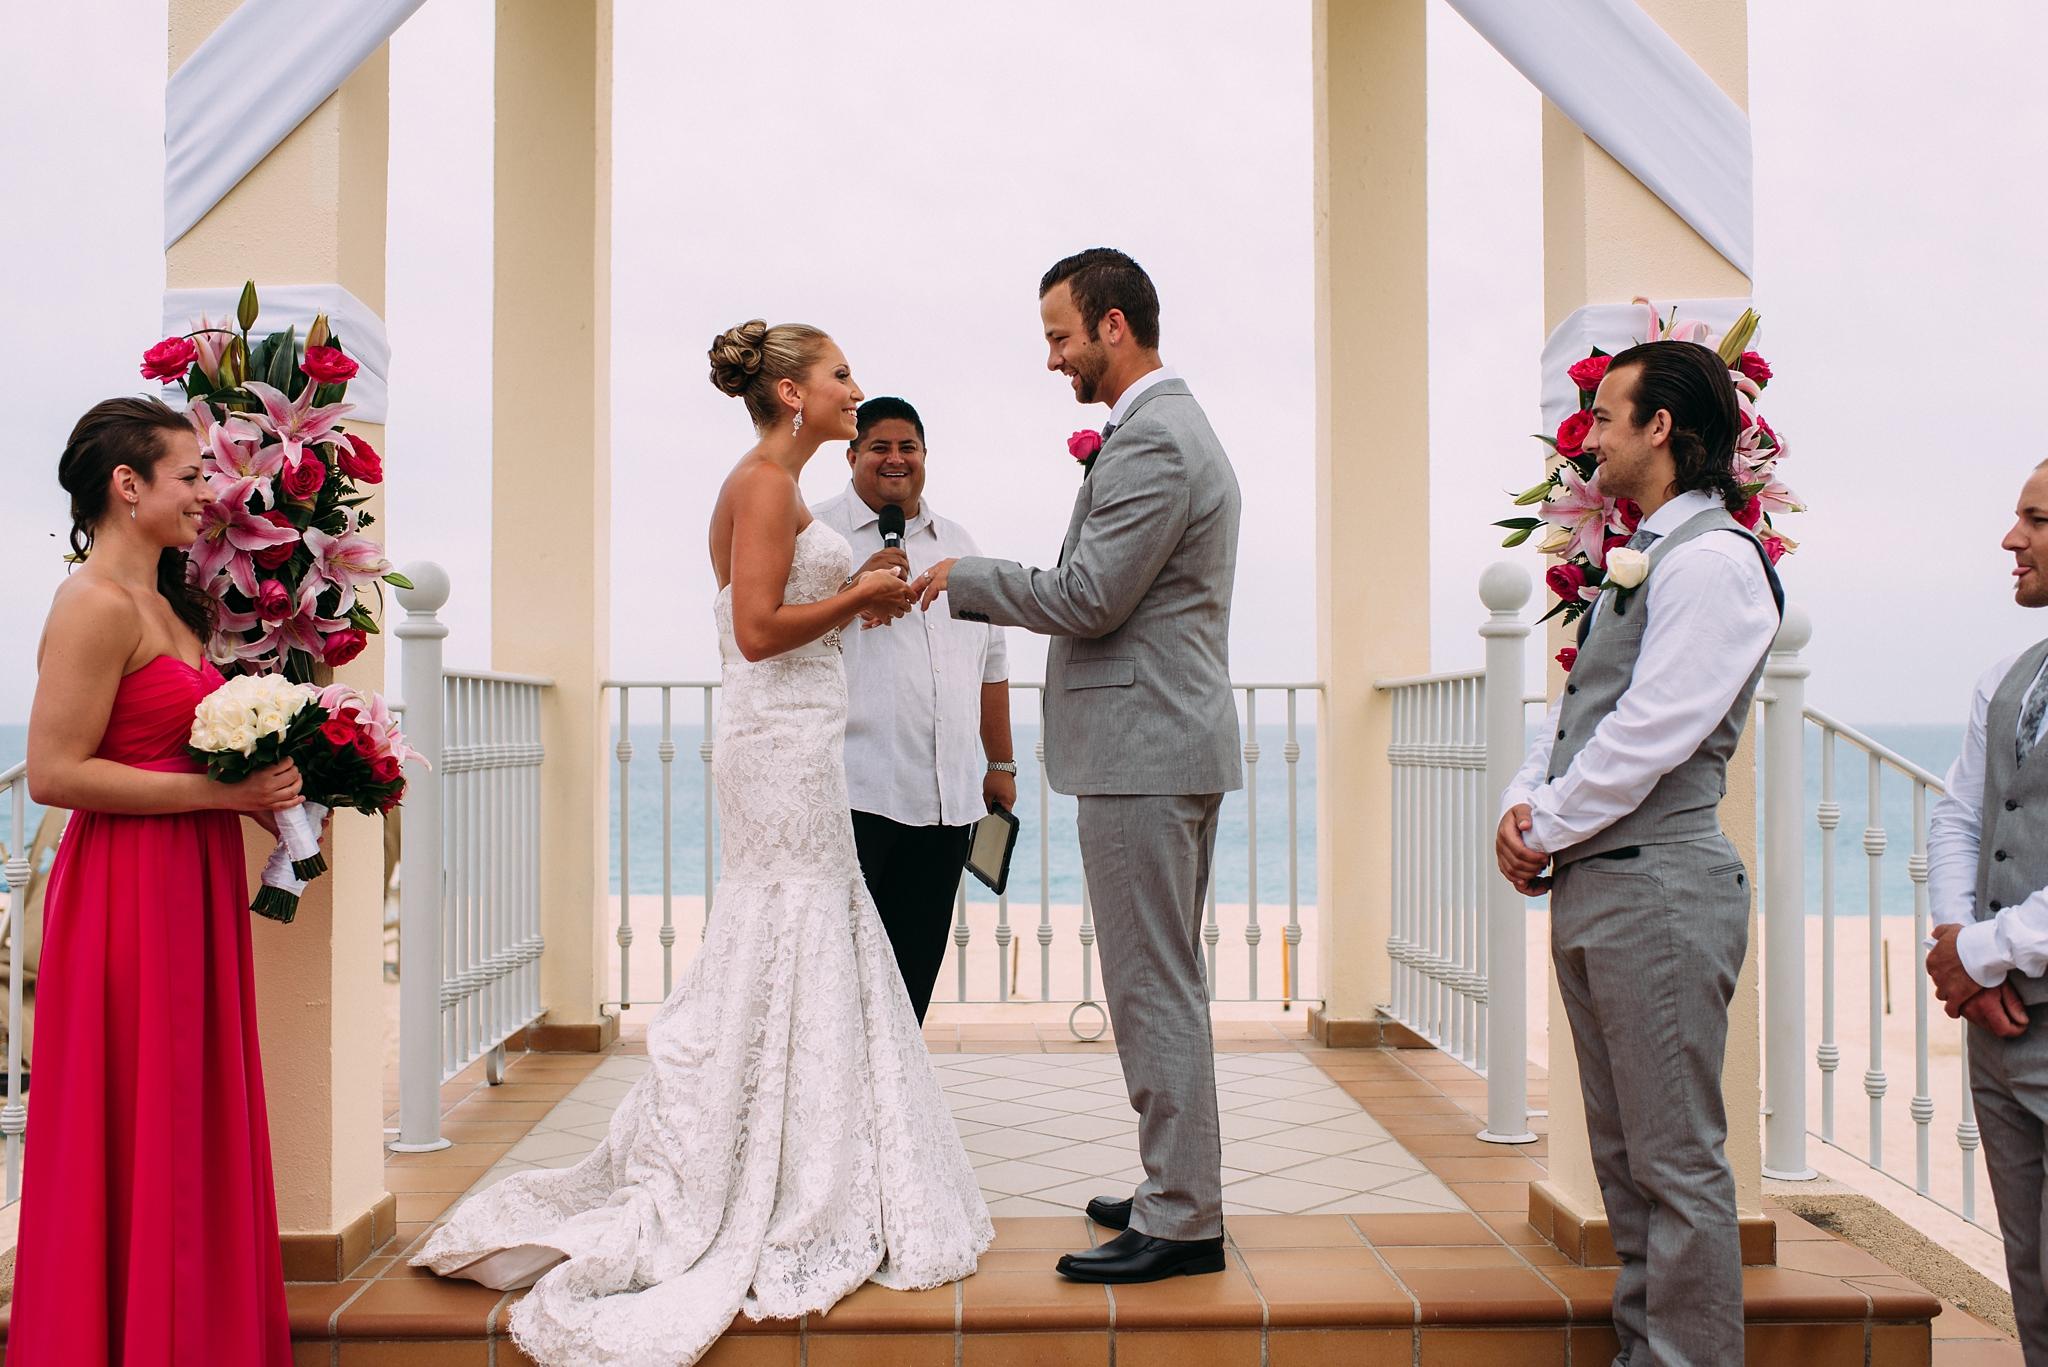 kaihla_tonai_intimate_wedding_elopement_photographer_1348